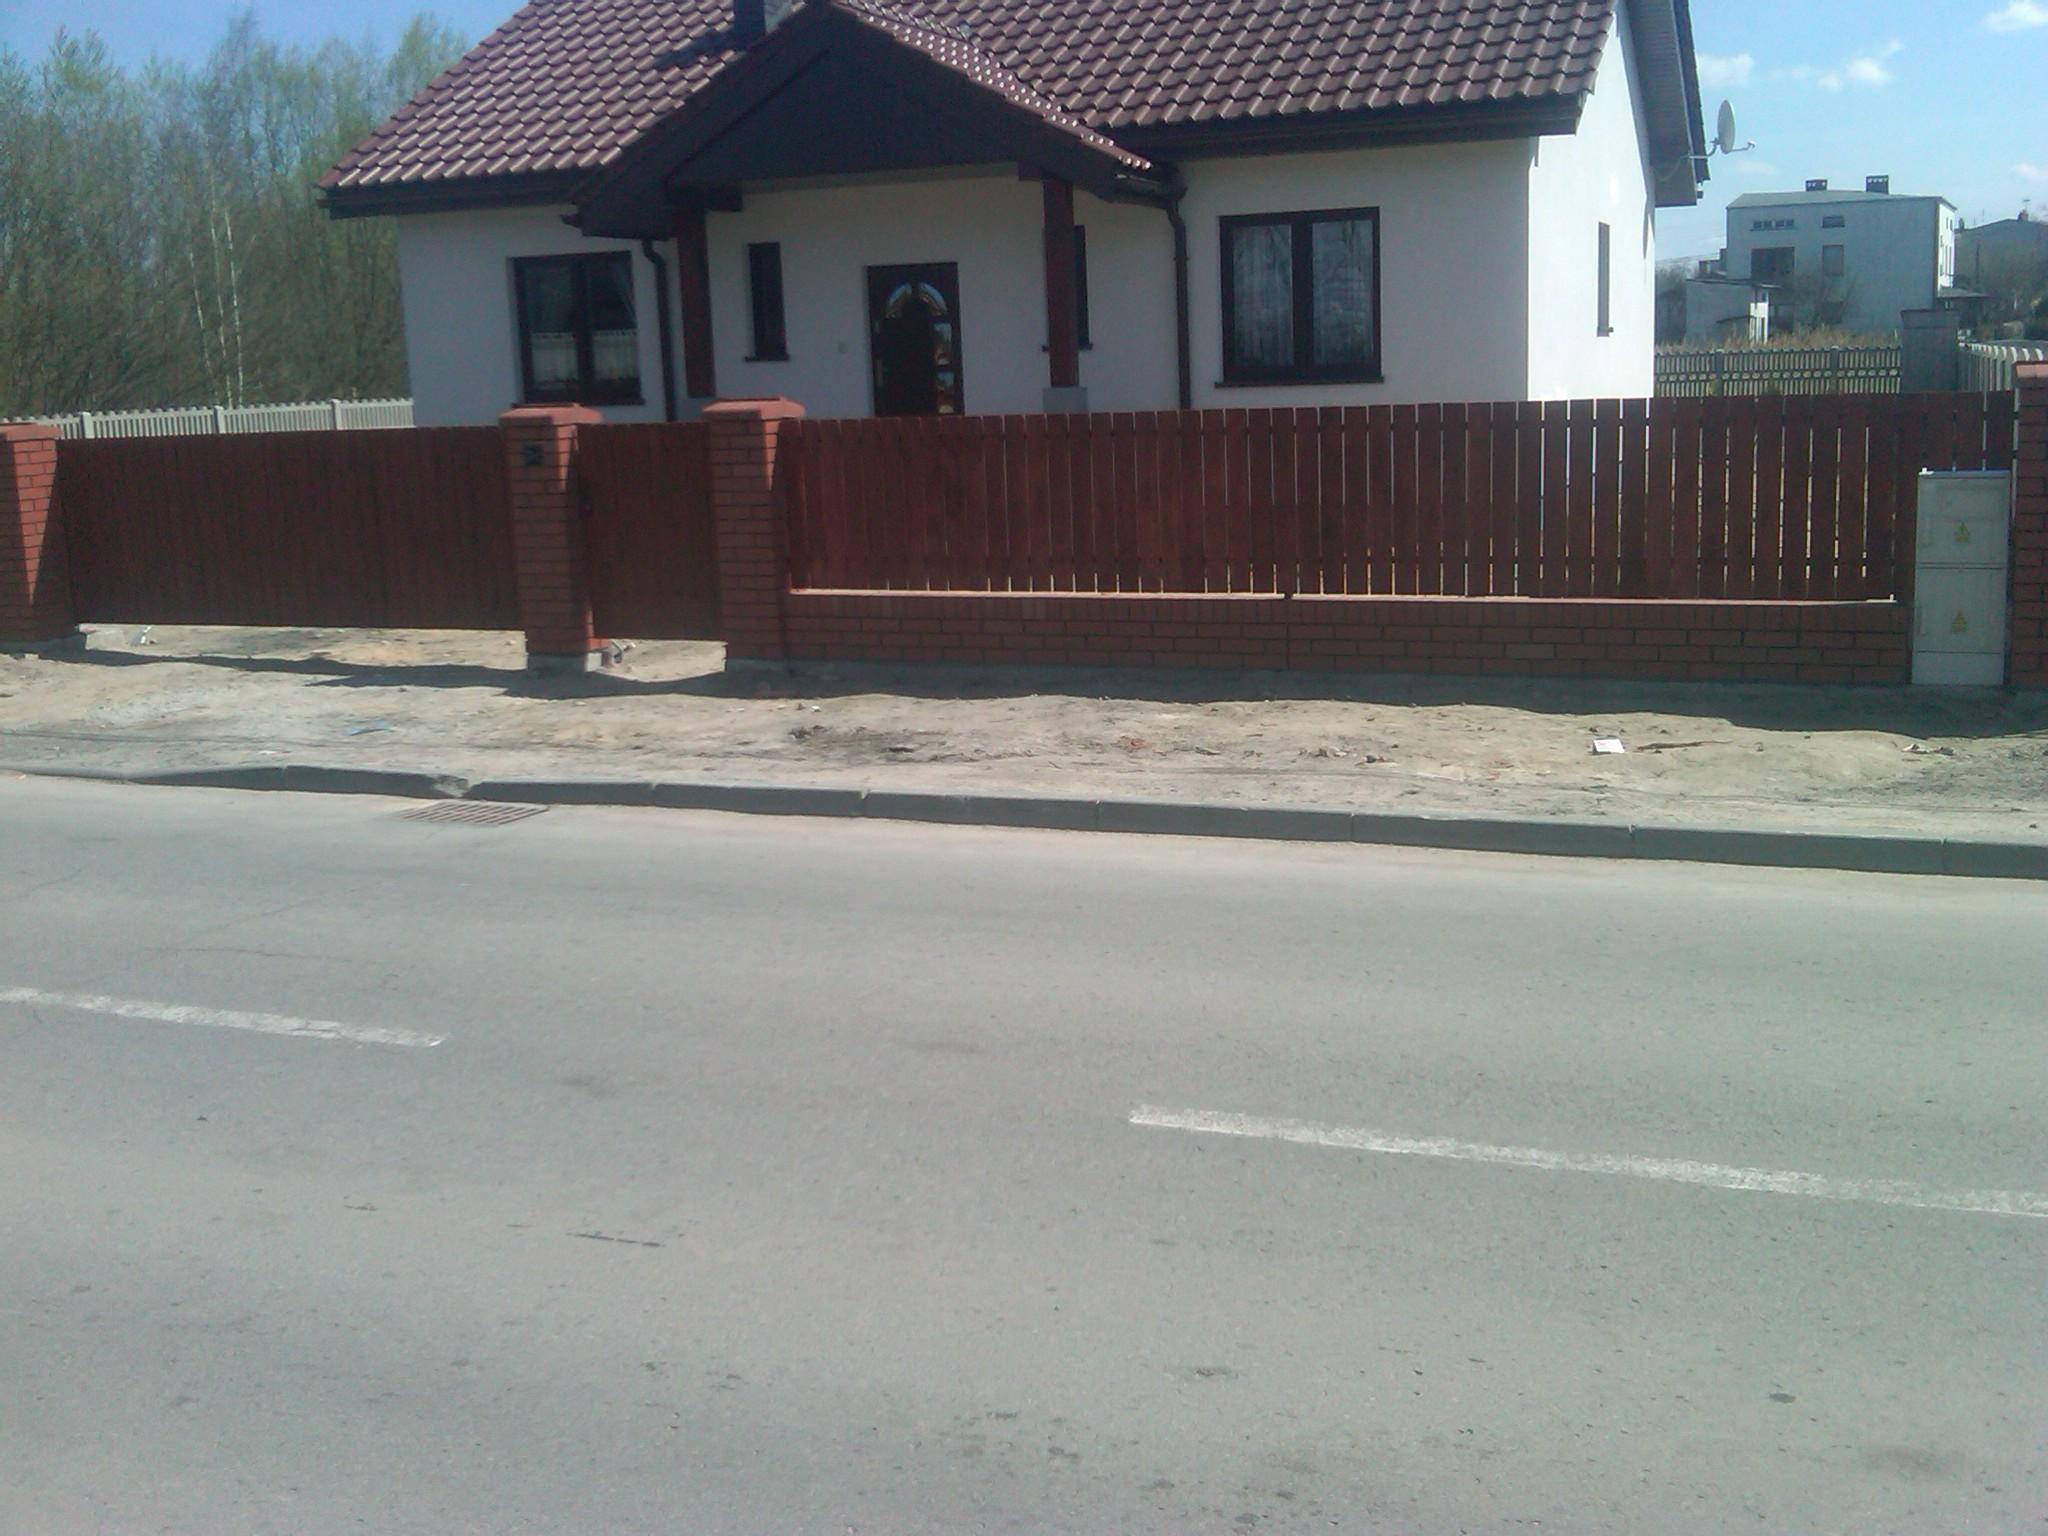 img00481-20110419-1300